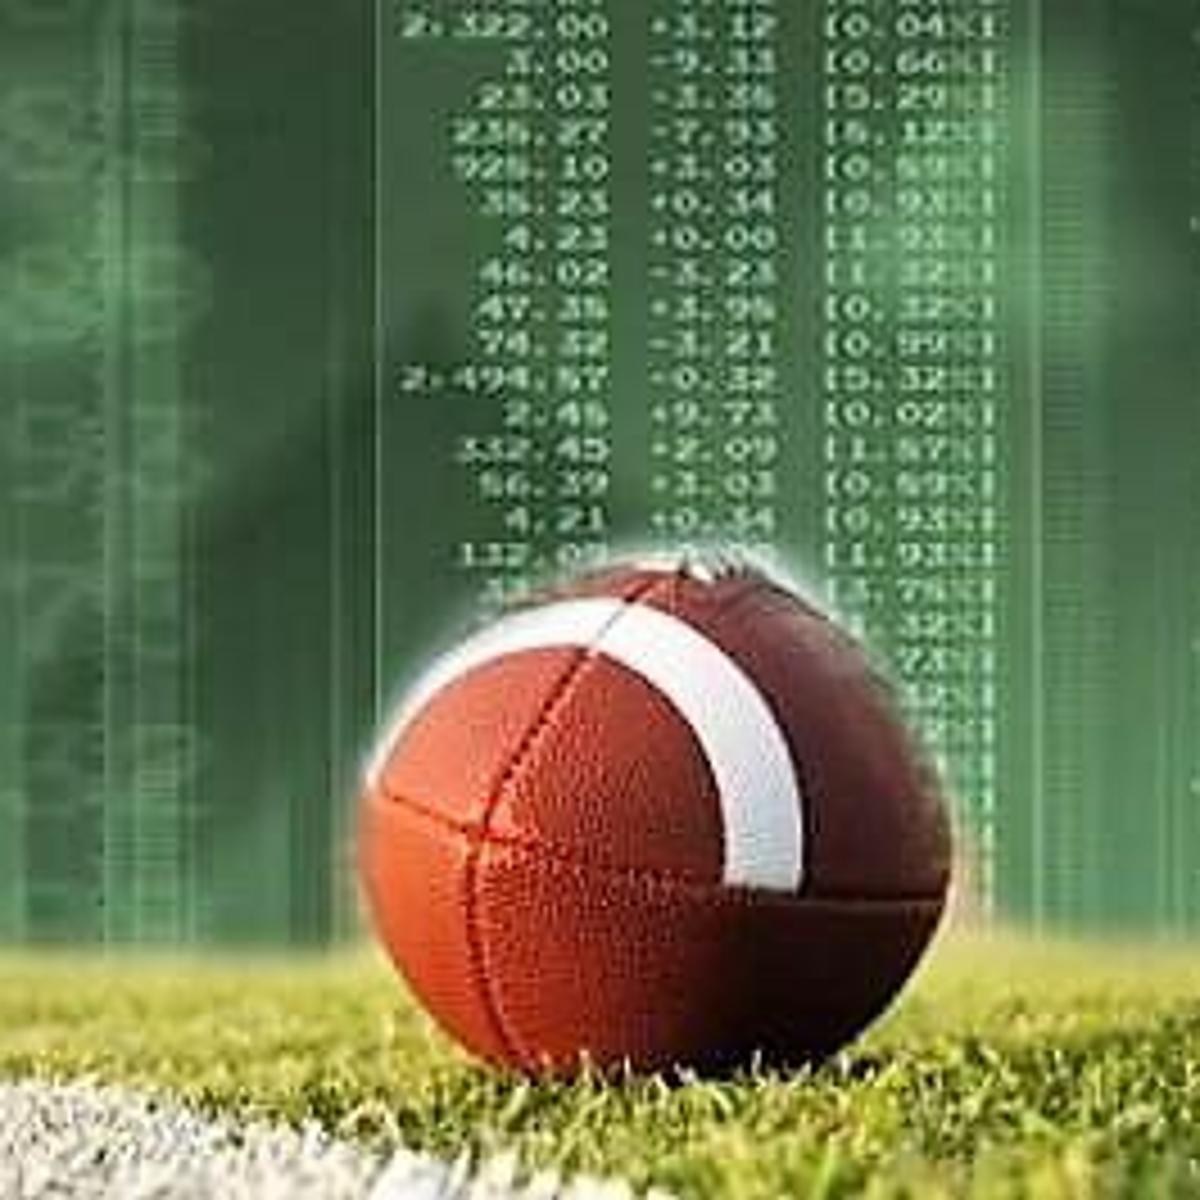 The Nebraska High School All-State Football Project